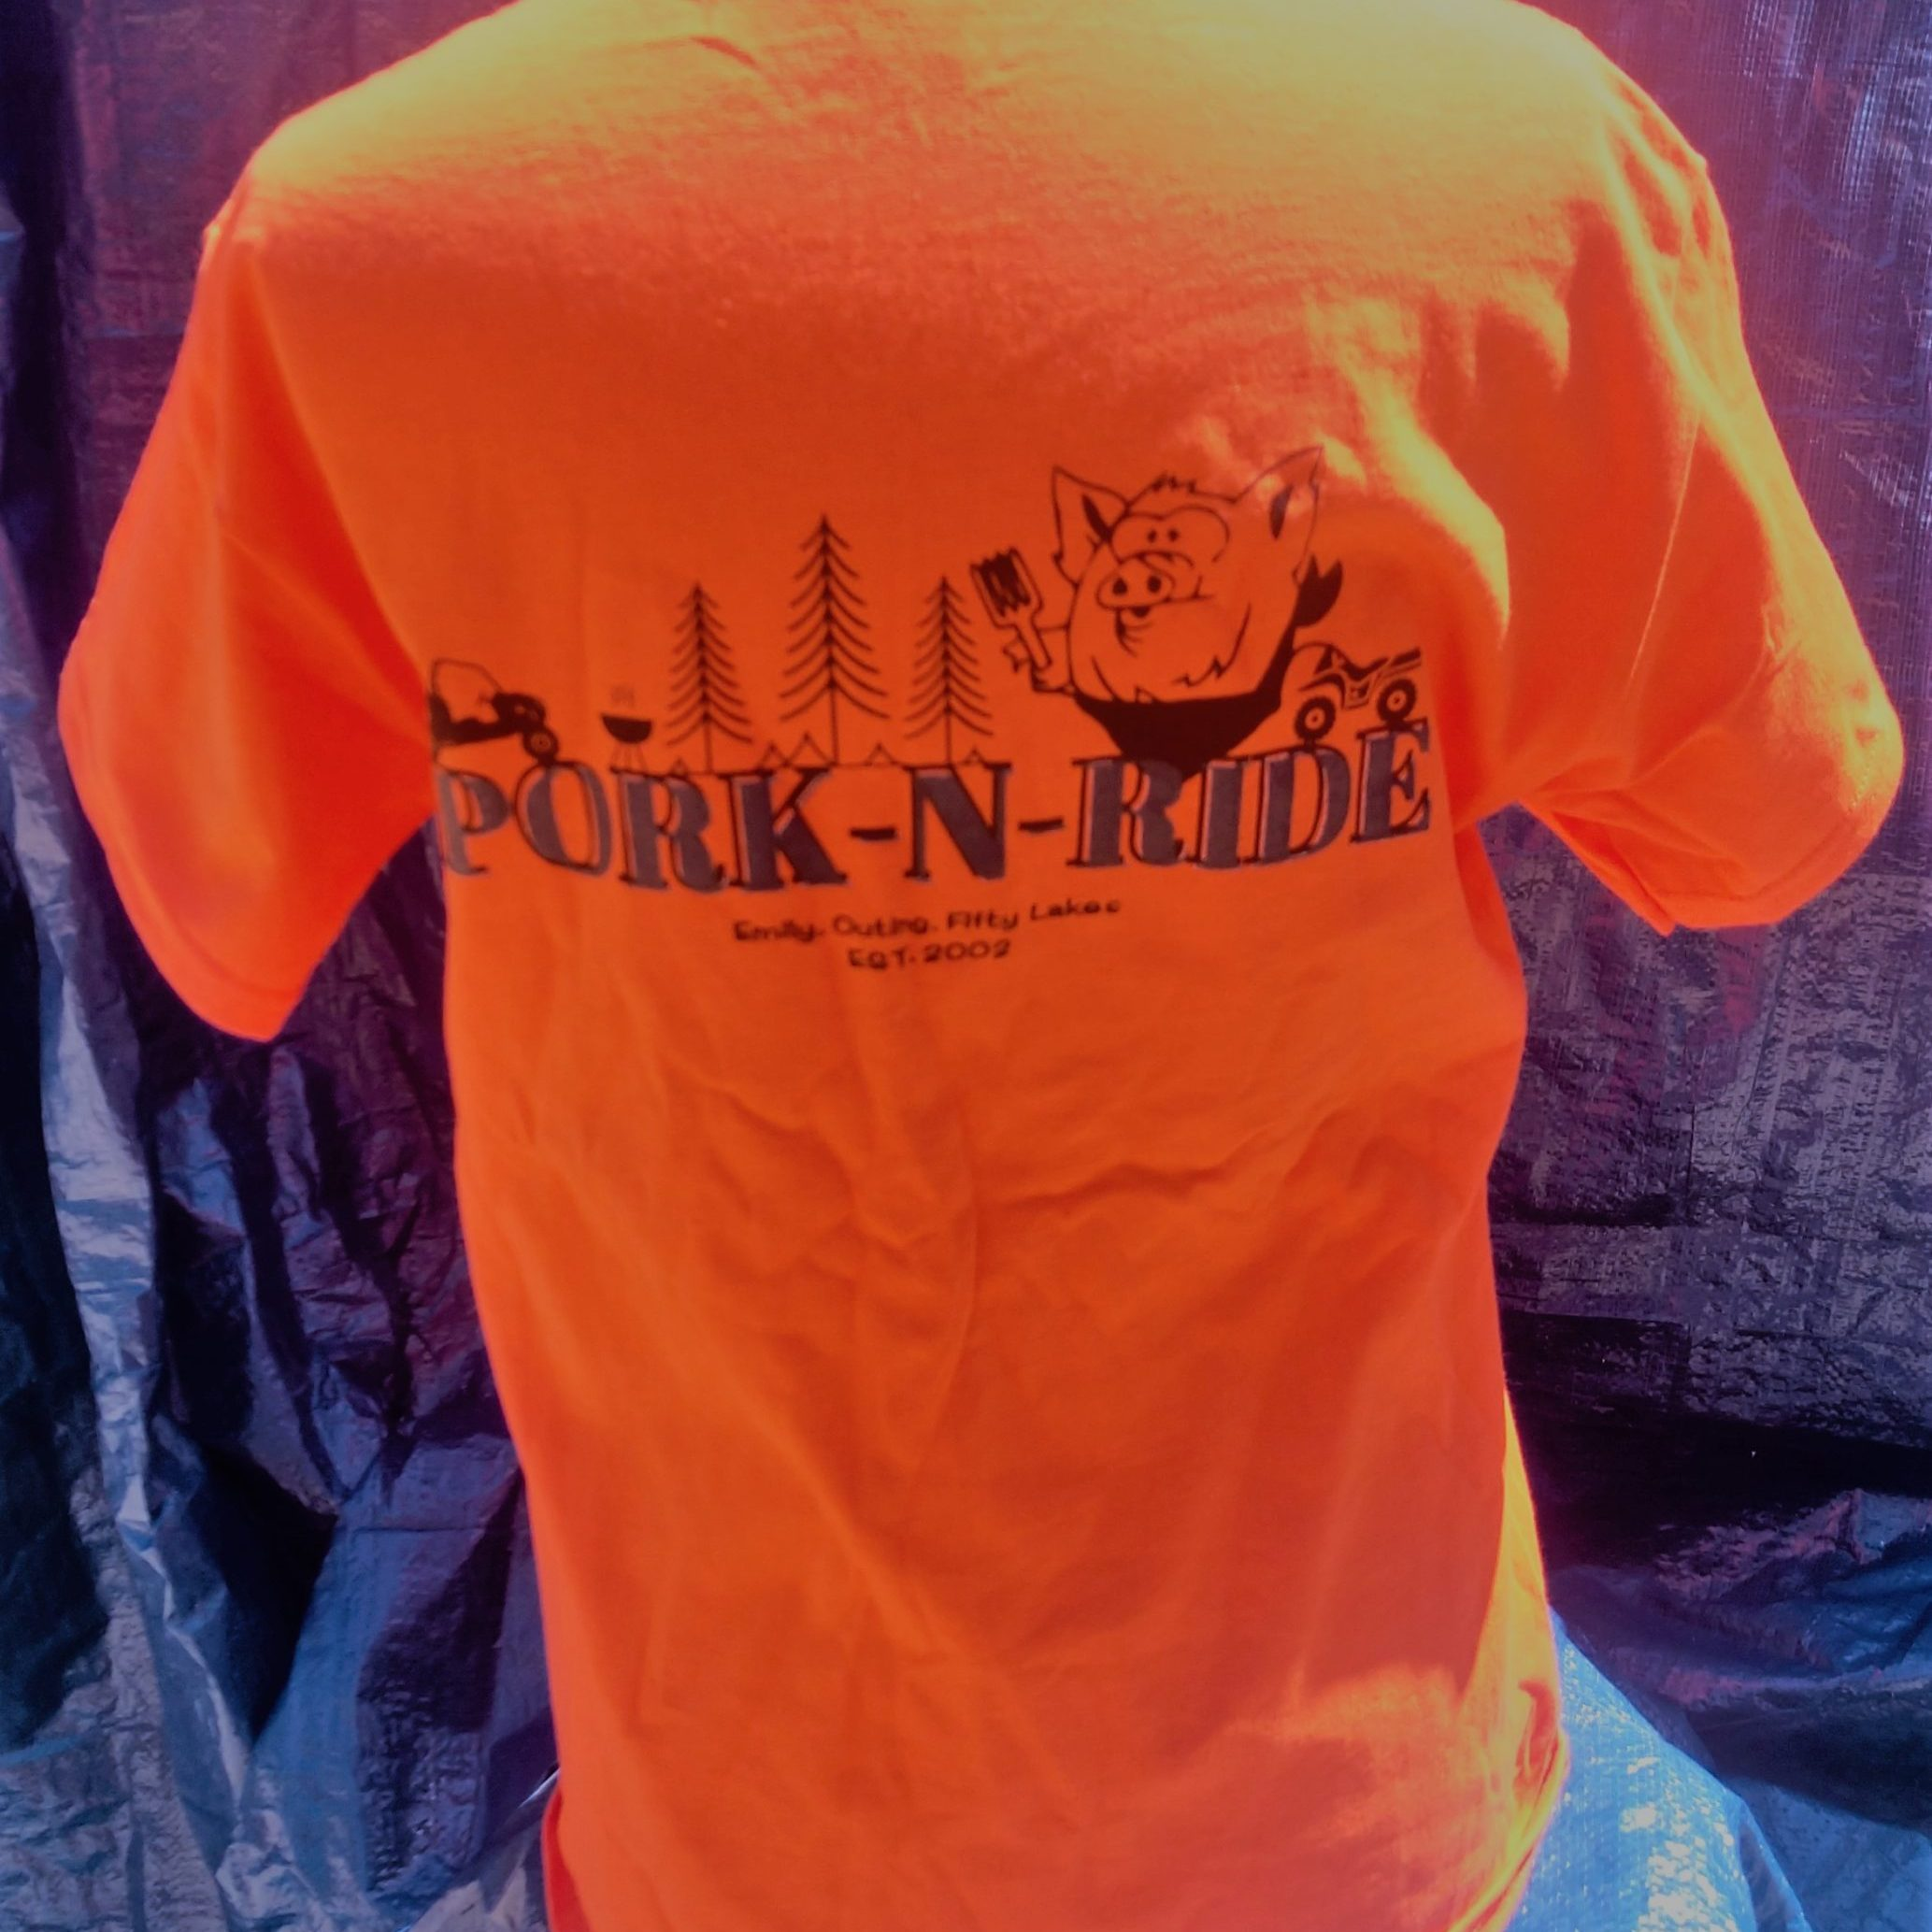 Pork N Ride SHort Sleeve T-Shirt - Safety Orange